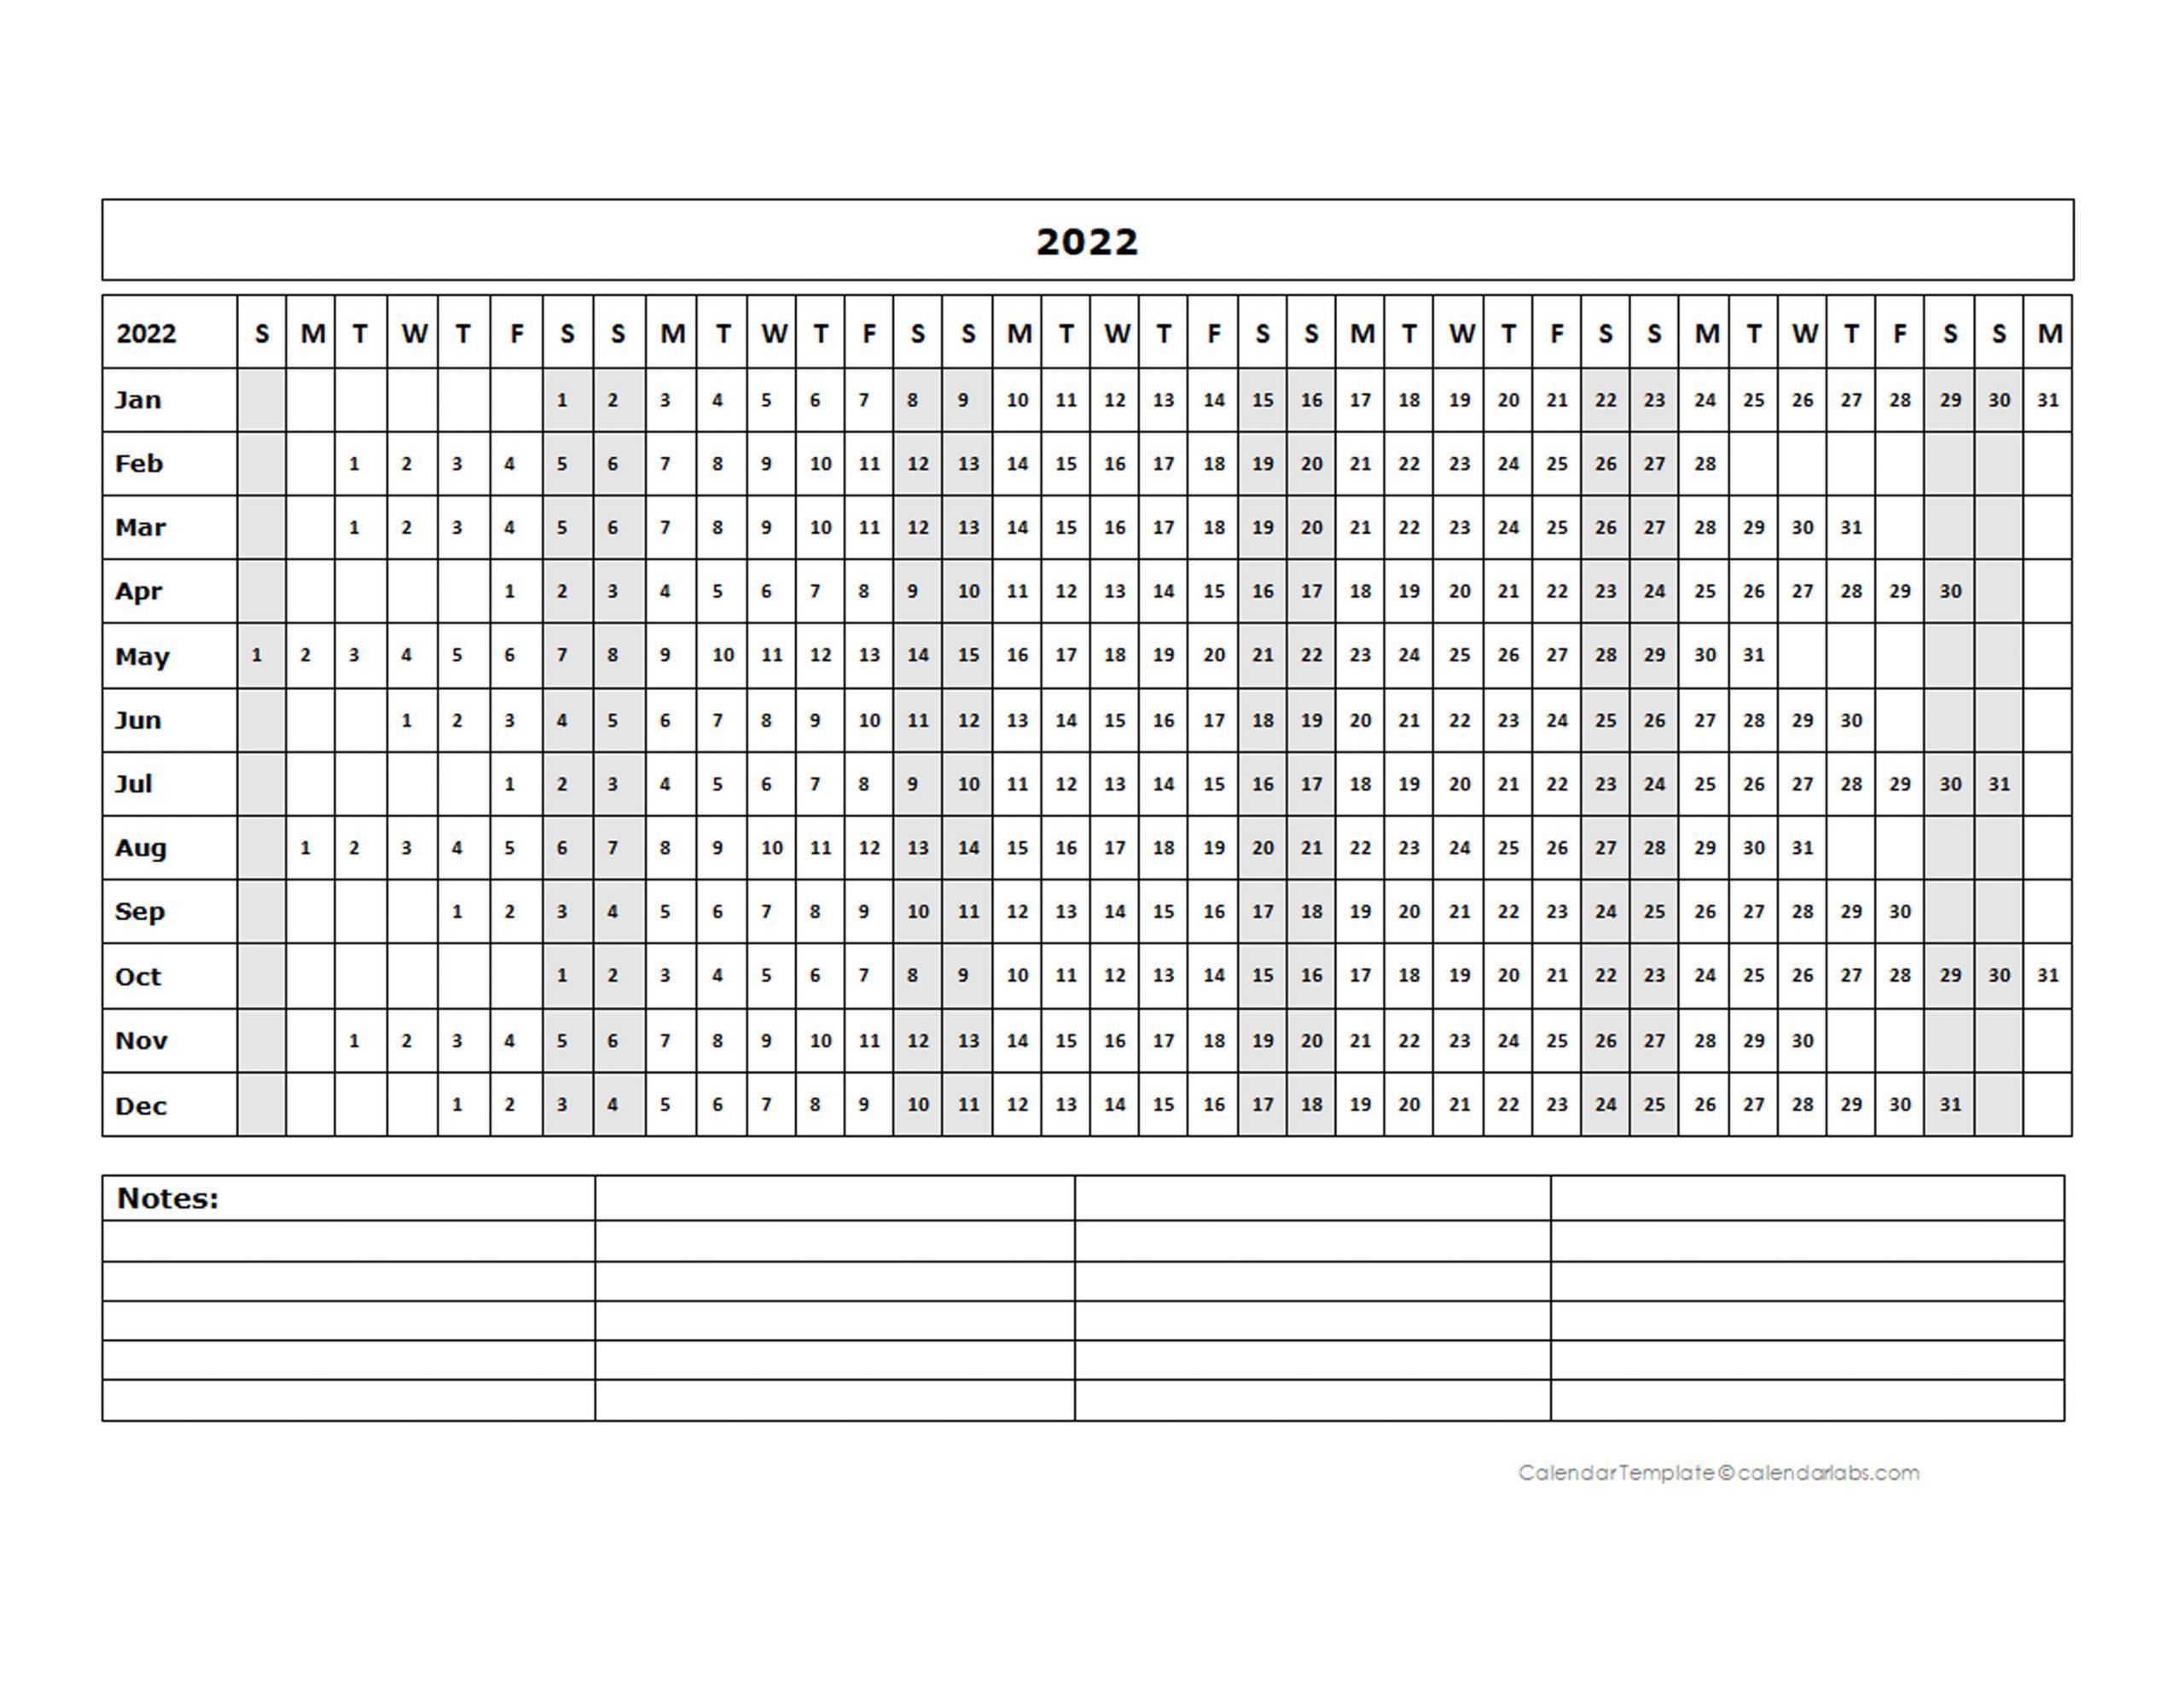 2022 Blank Landscape Yearly Calendar Template – Free Inside Julian Date Calendar 2022